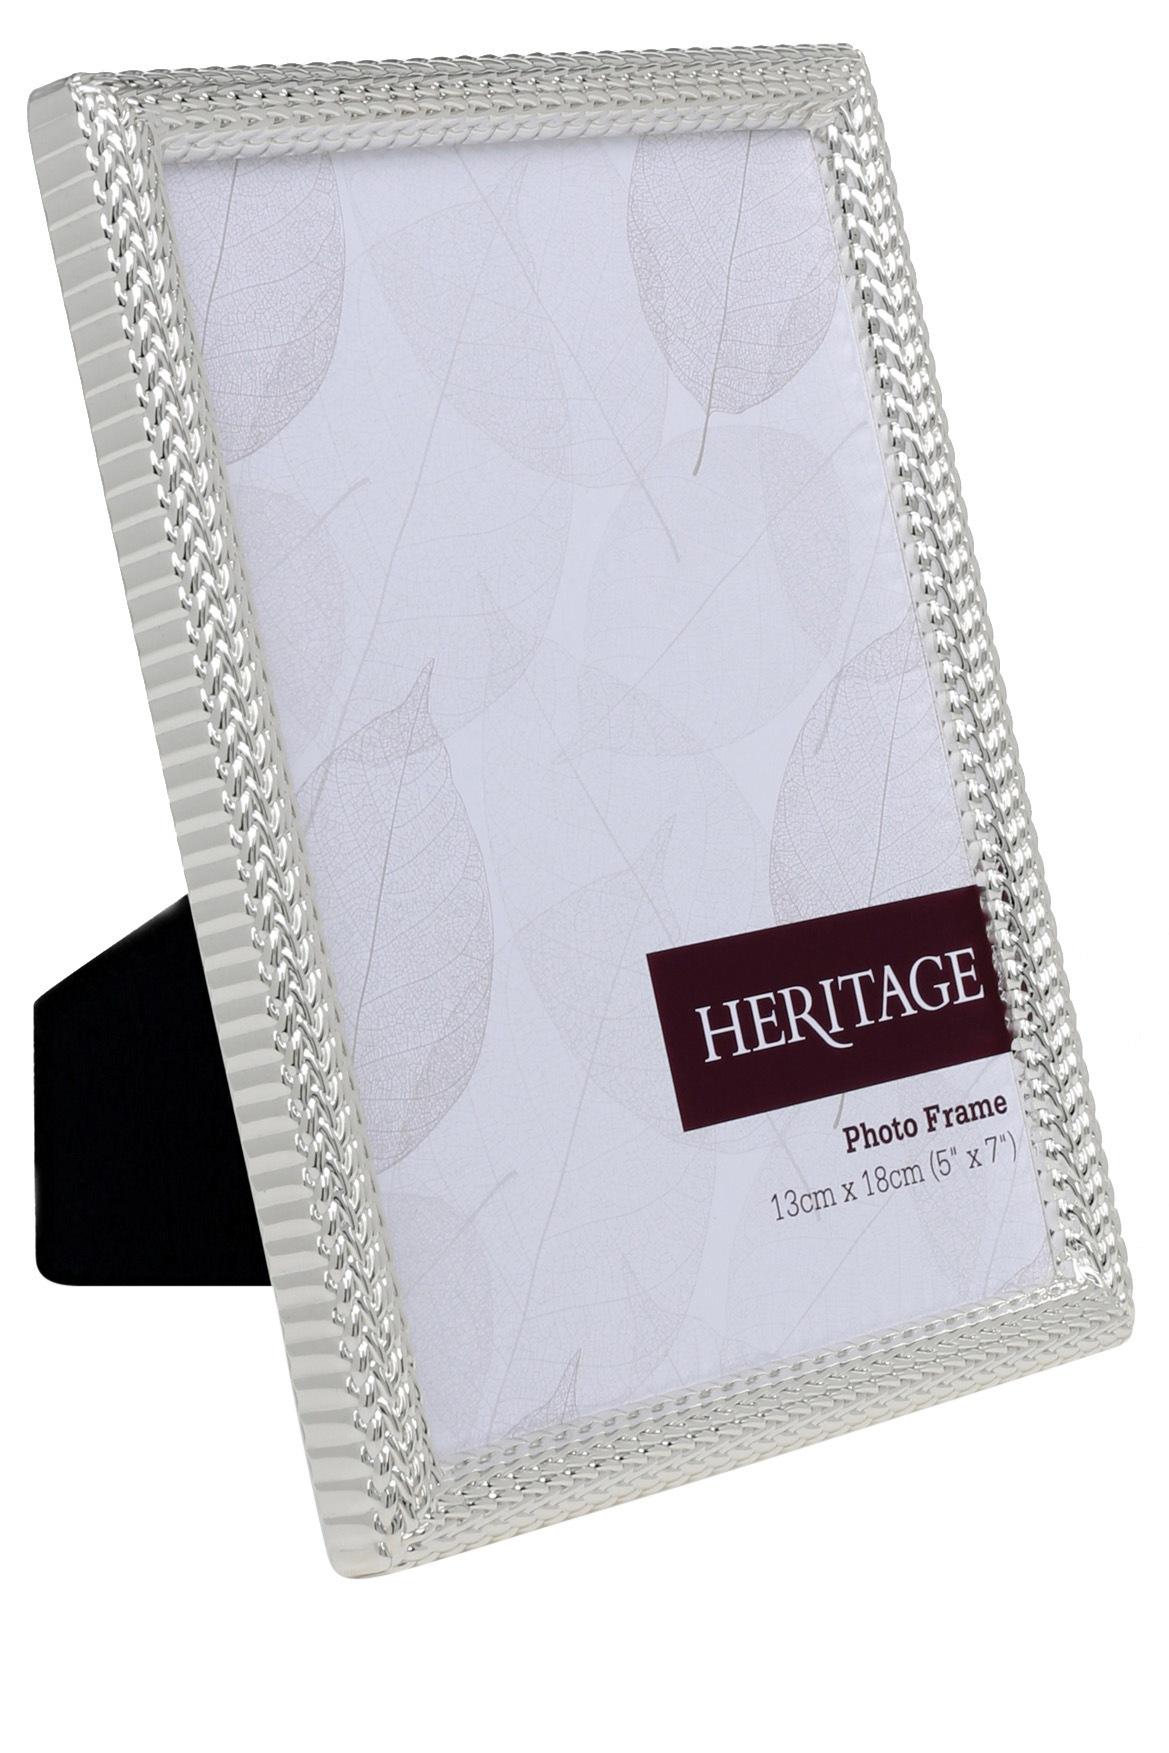 Heritage | Bloomsbury Frame 10x15cm | Myer Online